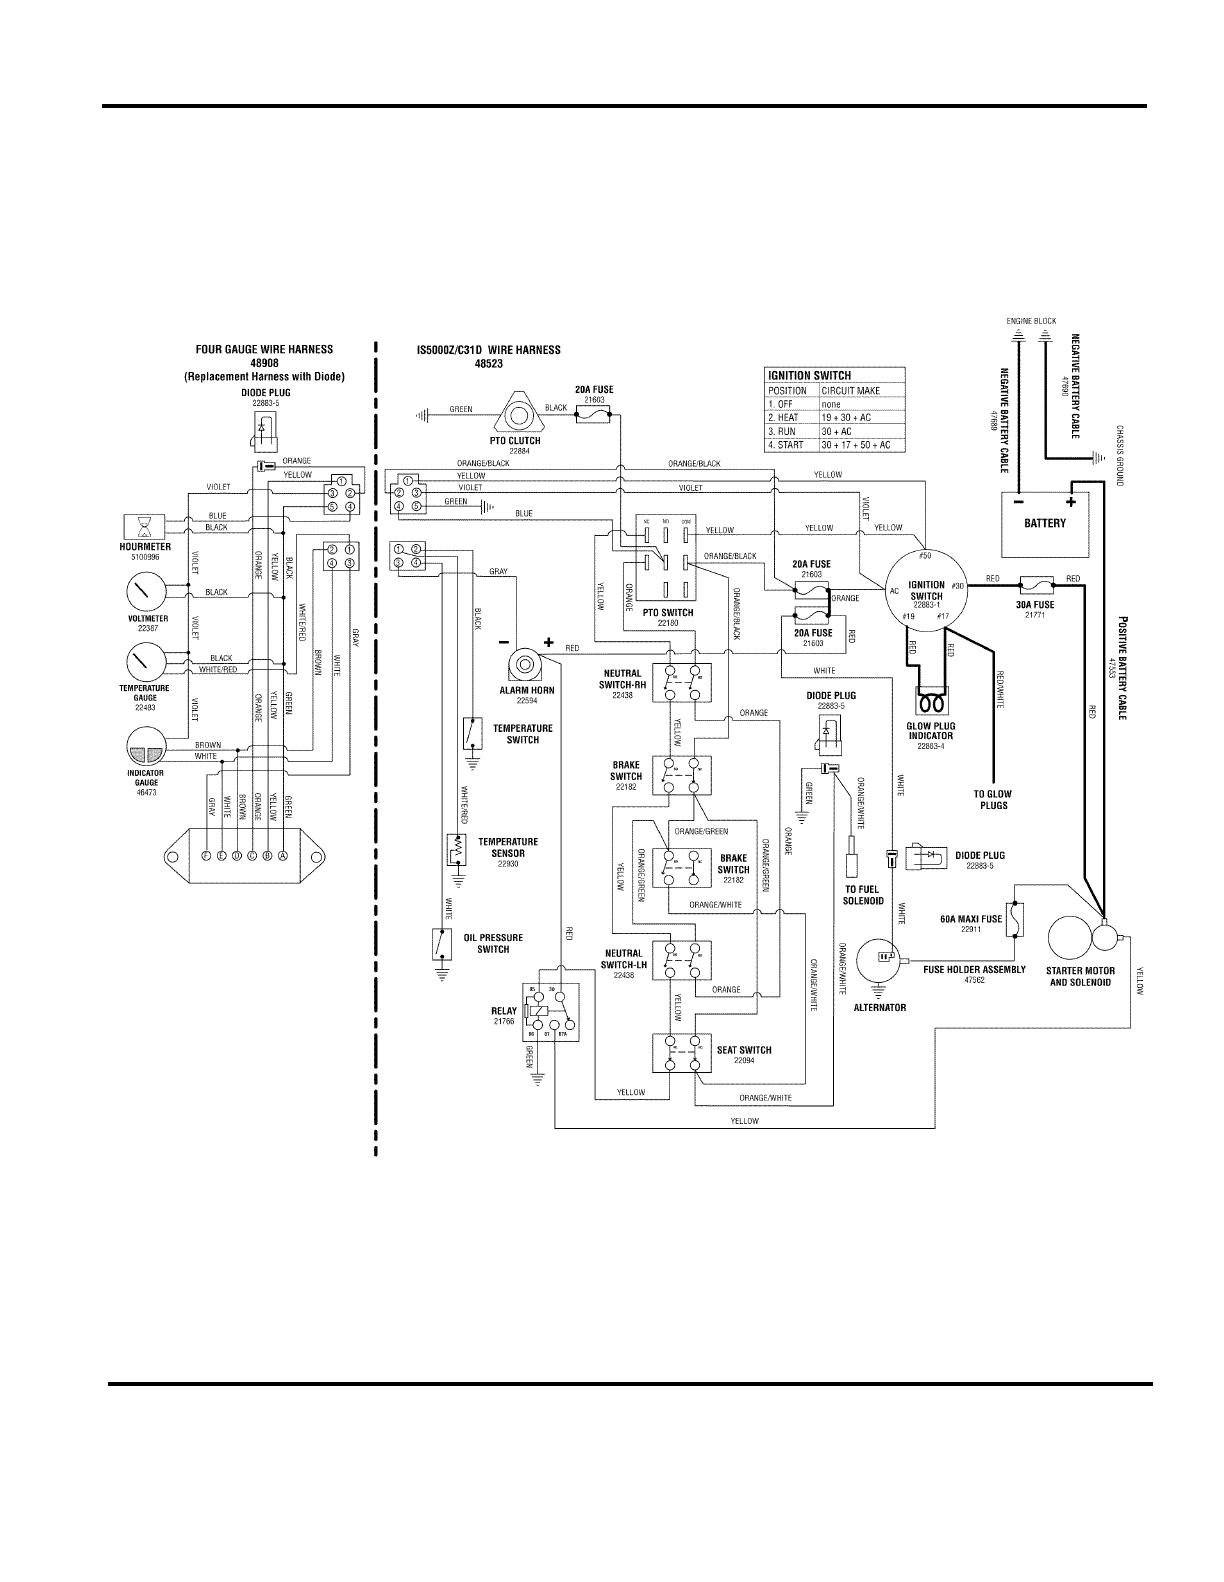 PartsManual 5900205 Ferris IS5000Zseries1226andabove Parts